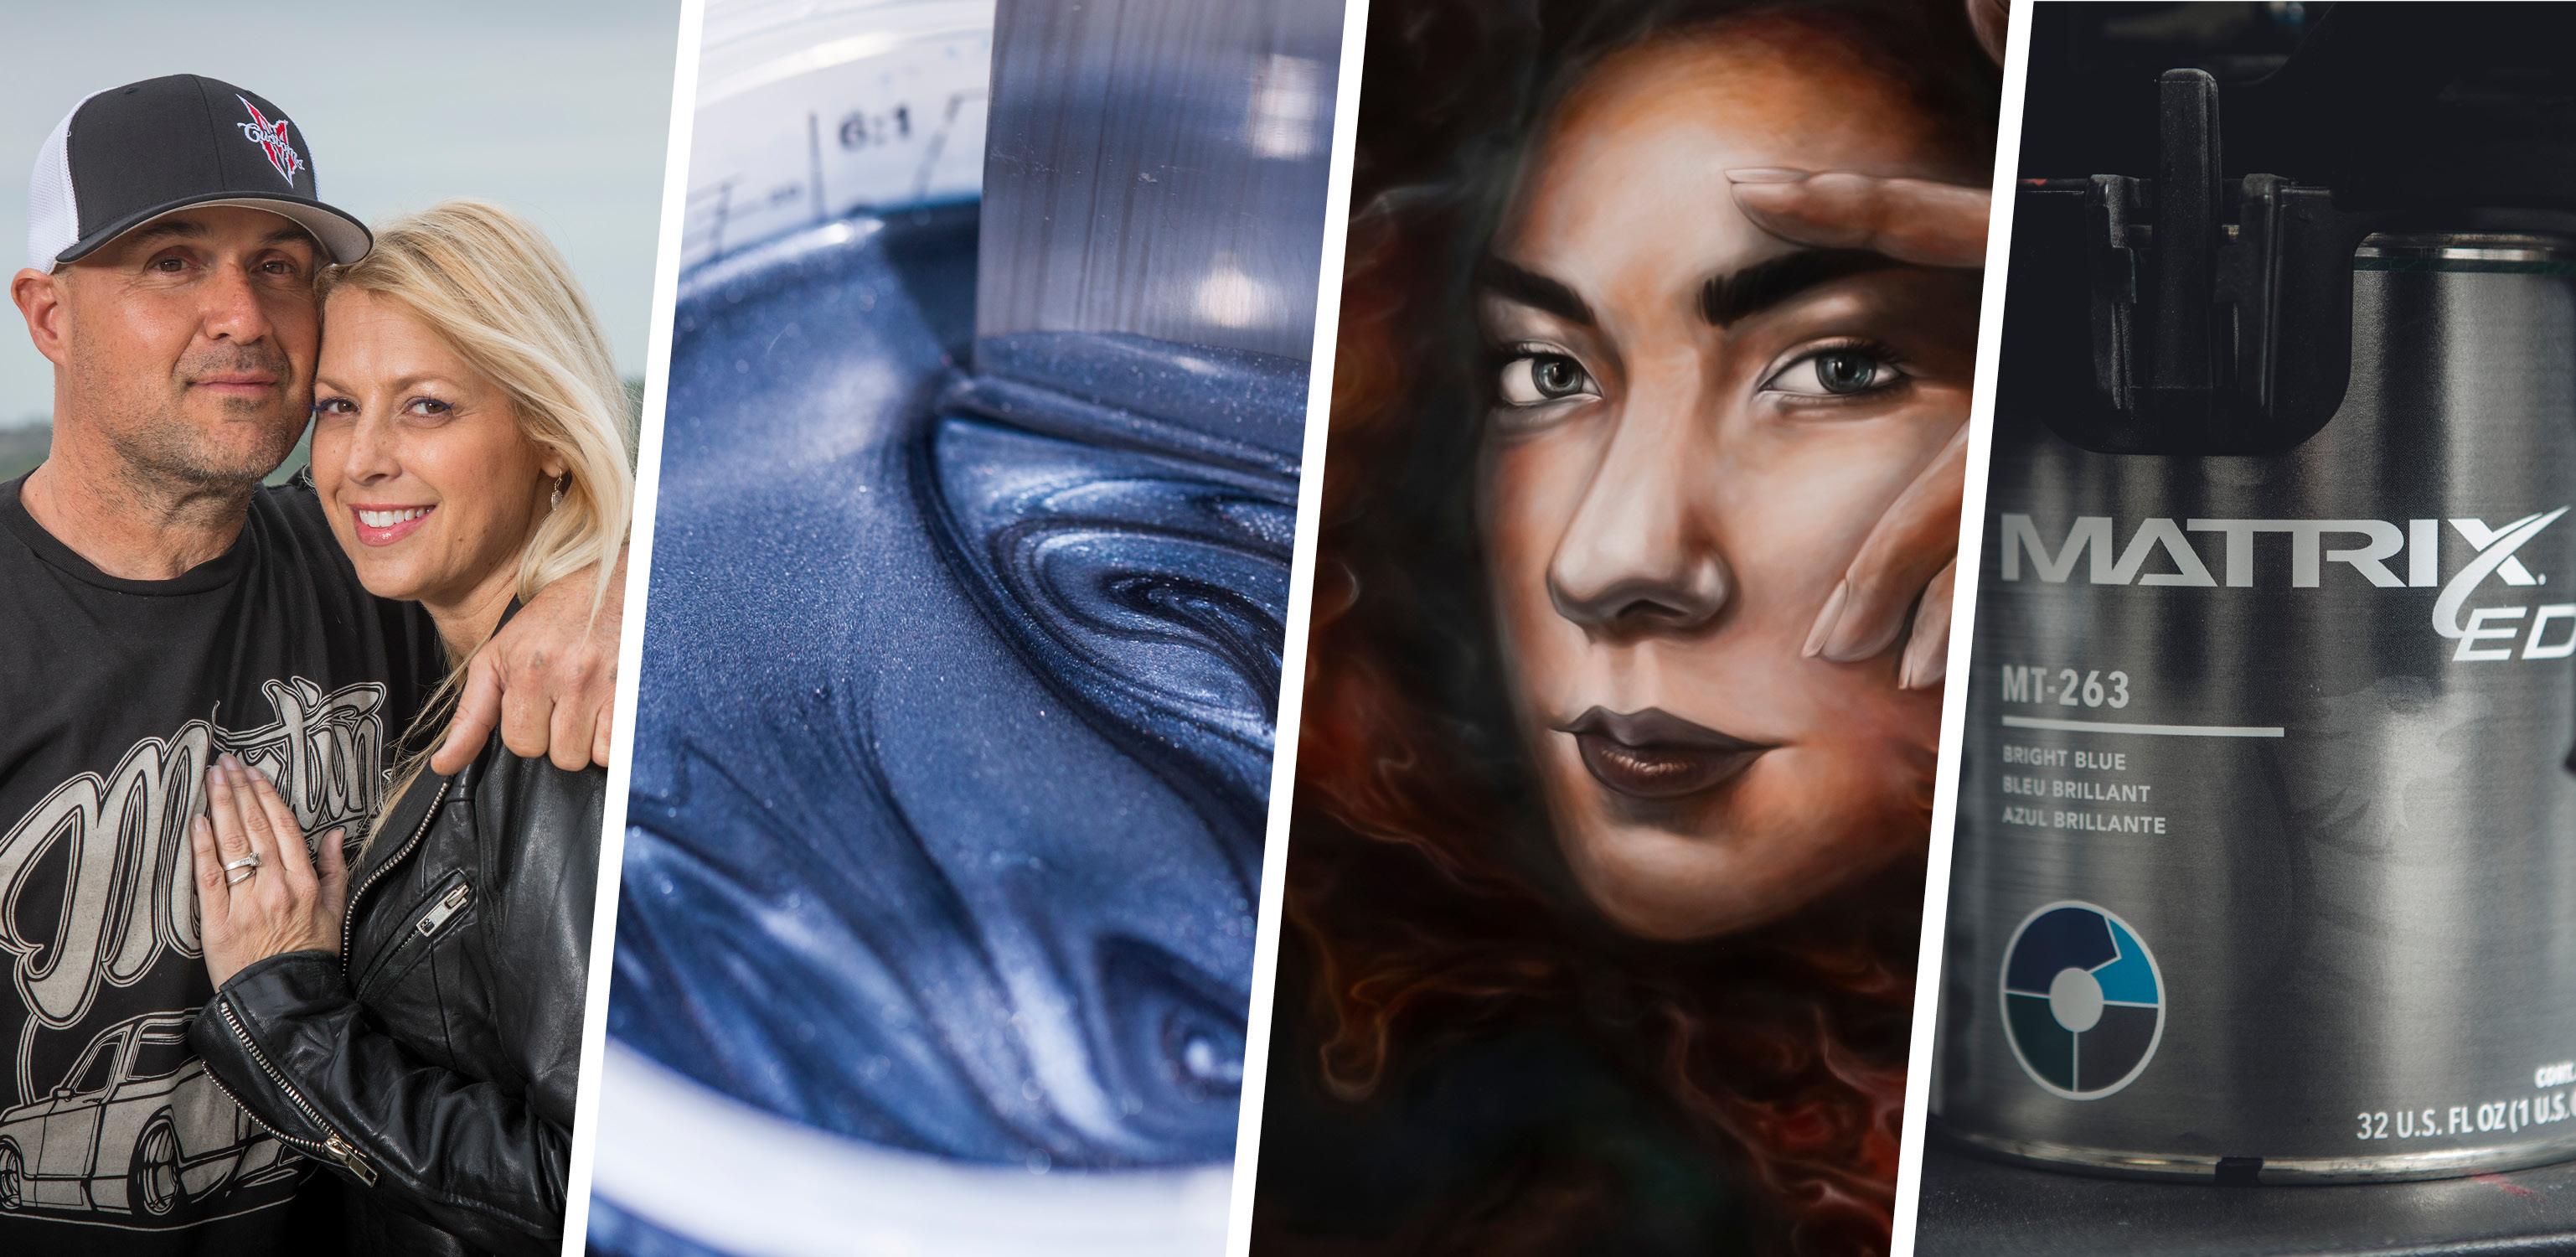 Sherwin-Williams - Sema 2019 Booth Artists